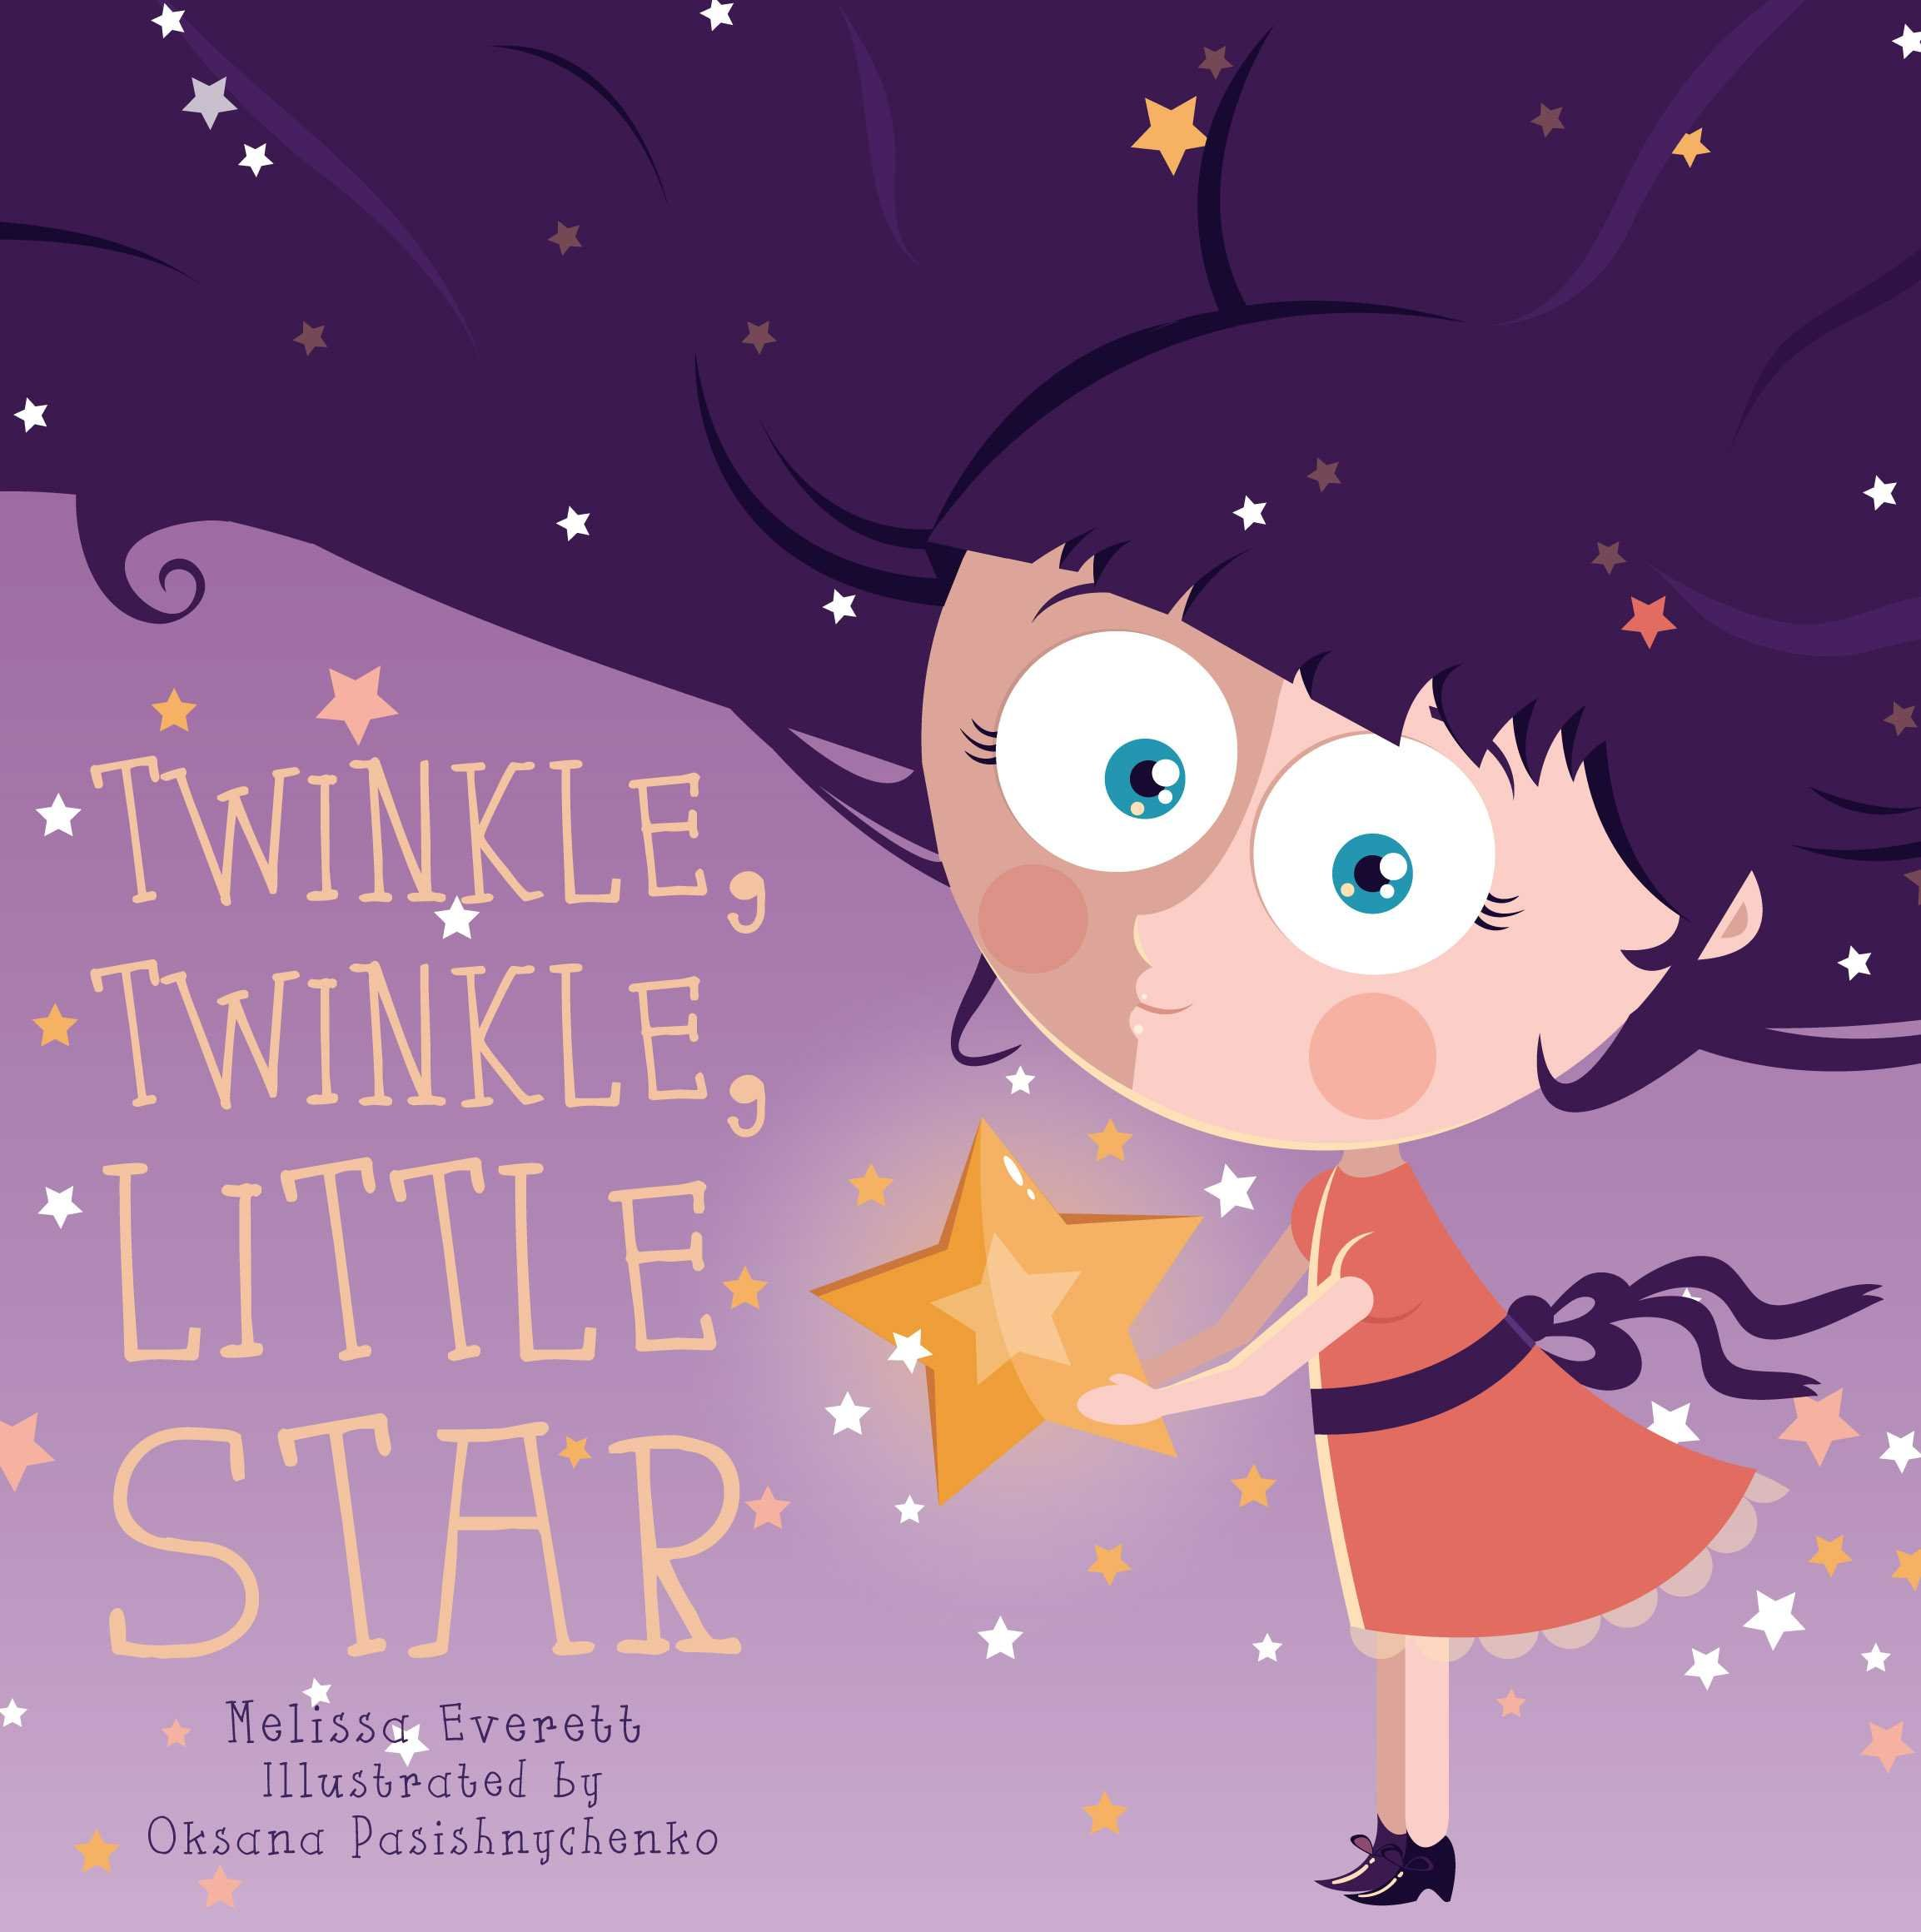 Celebrity clipart twinkle twinkle little star Star Versed (Re Rhymes): Twinkle